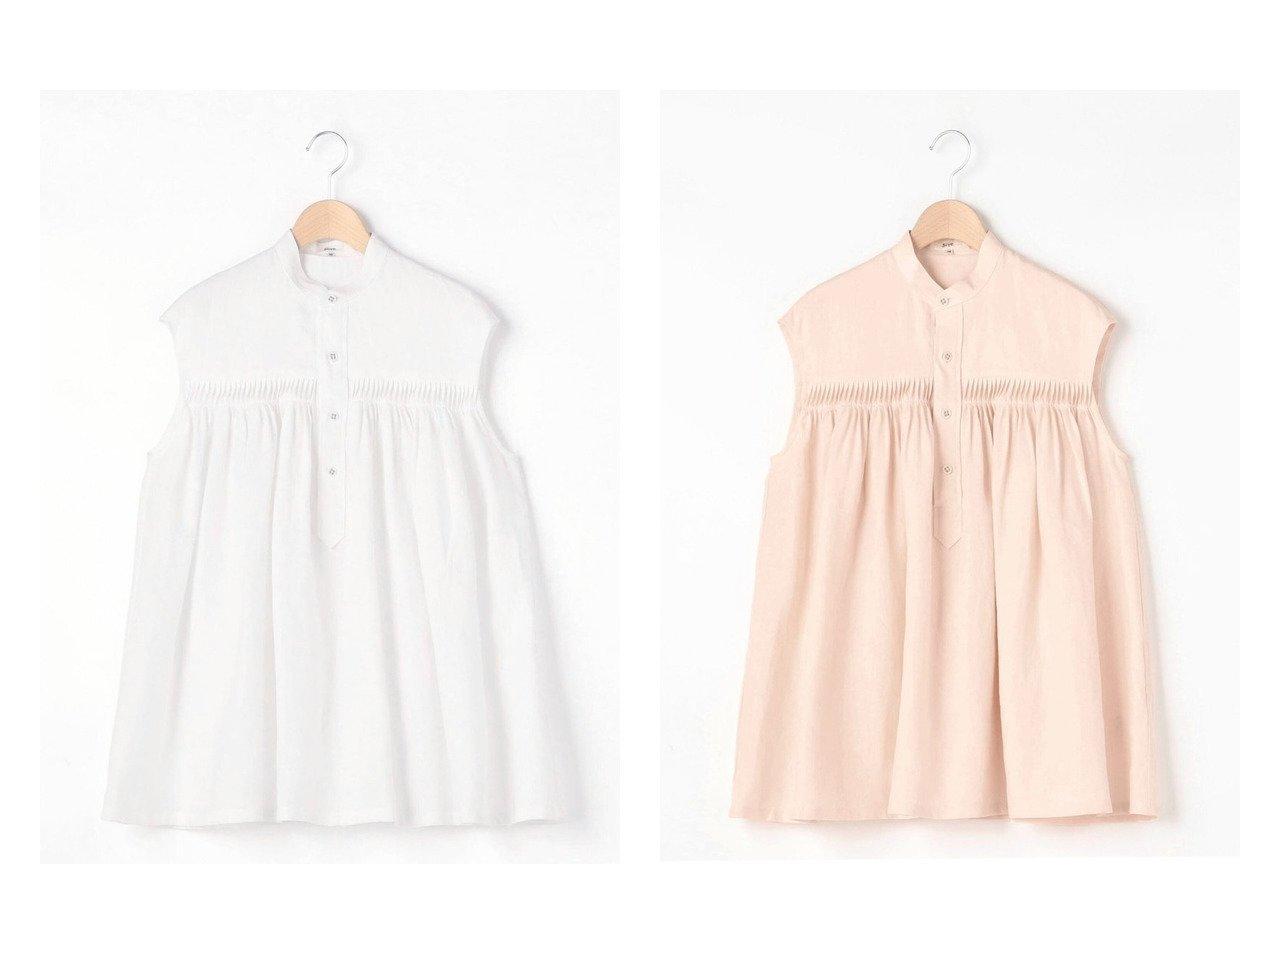 【Bshop/ビショップ】の【Scye】リネンピンタック ノースリーブシャツ WOMEN 【トップス・カットソー】おすすめ!人気、トレンド・レディースファッションの通販 おすすめで人気の流行・トレンド、ファッションの通販商品 インテリア・家具・メンズファッション・キッズファッション・レディースファッション・服の通販 founy(ファニー) https://founy.com/ ファッション Fashion レディースファッション WOMEN トップス・カットソー Tops/Tshirt キャミソール / ノースリーブ No Sleeves シャツ/ブラウス Shirts/Blouses アンティーク キャミソール ギャザー デニム ノースリーブ フレア リネン 人気 定番 Standard |ID:crp329100000048309